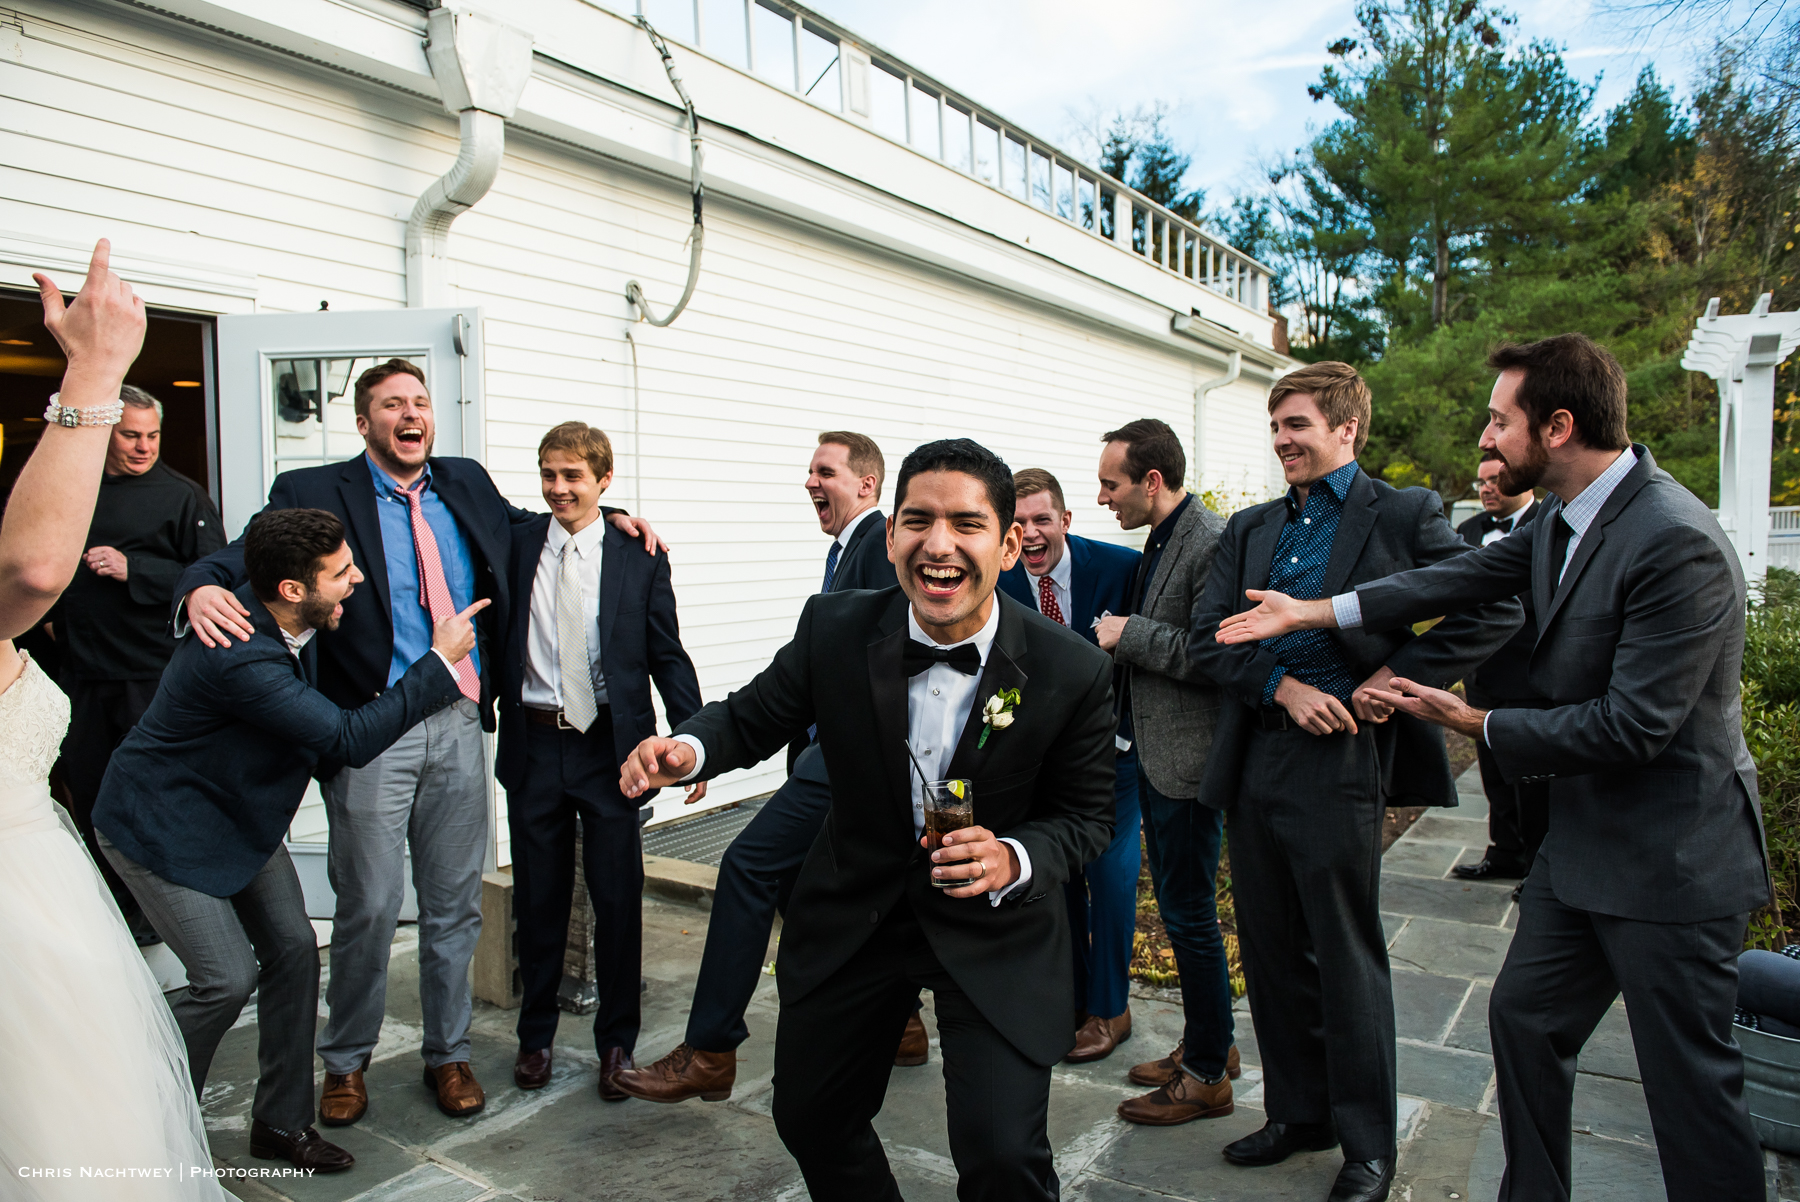 wedding-the-litchfield-inn-ct-photos-chris-nachtwey-photography-2018-44.jpg